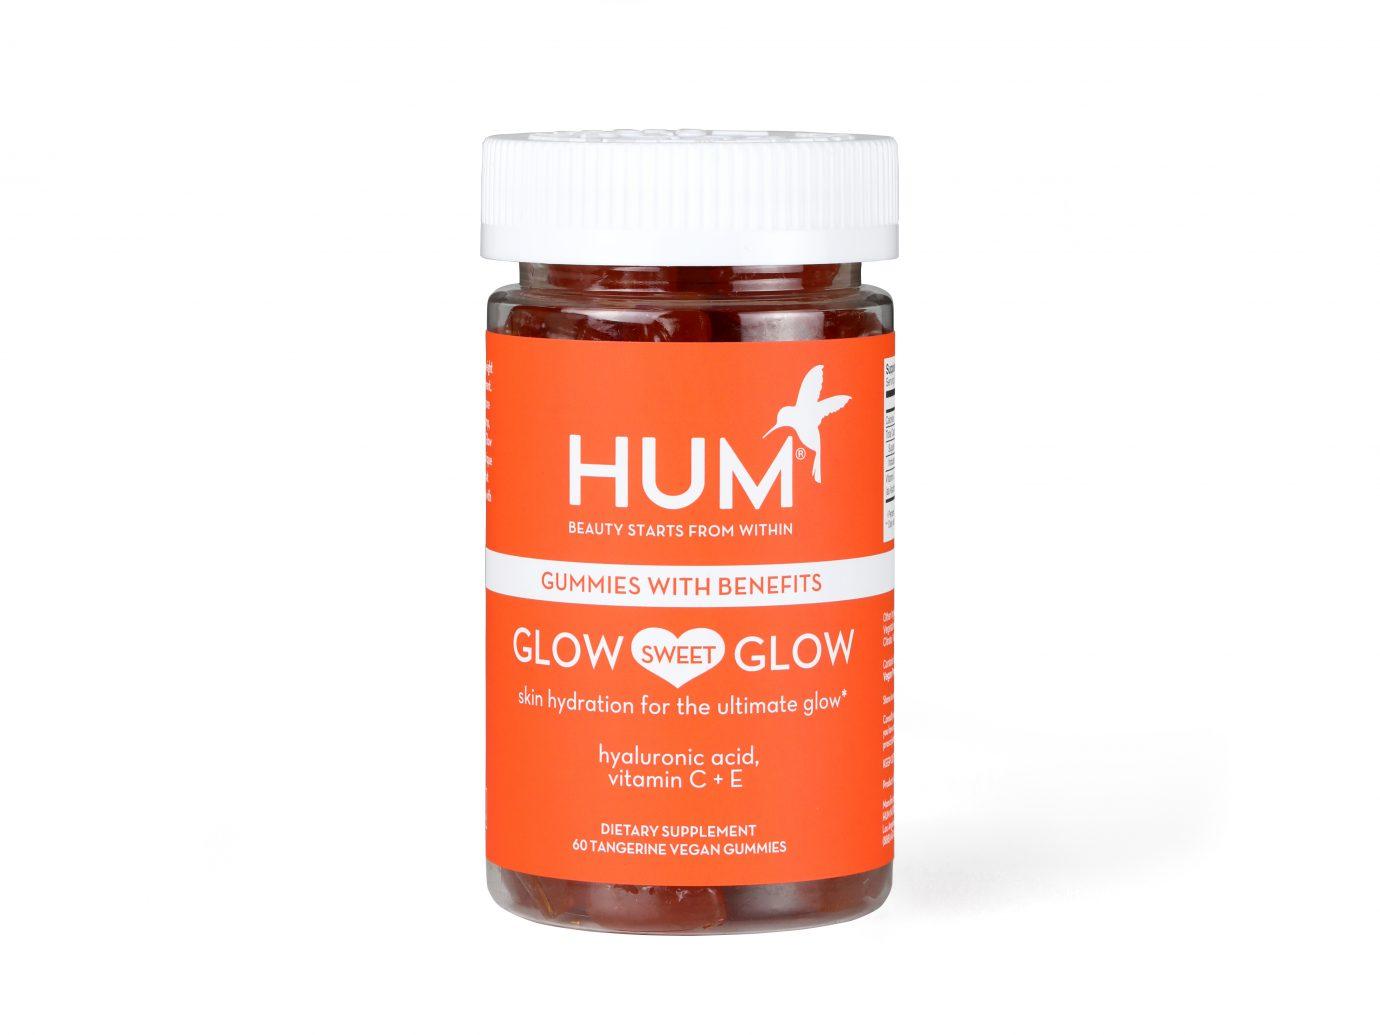 Summer Glow product Hum Glow Sweet Glow